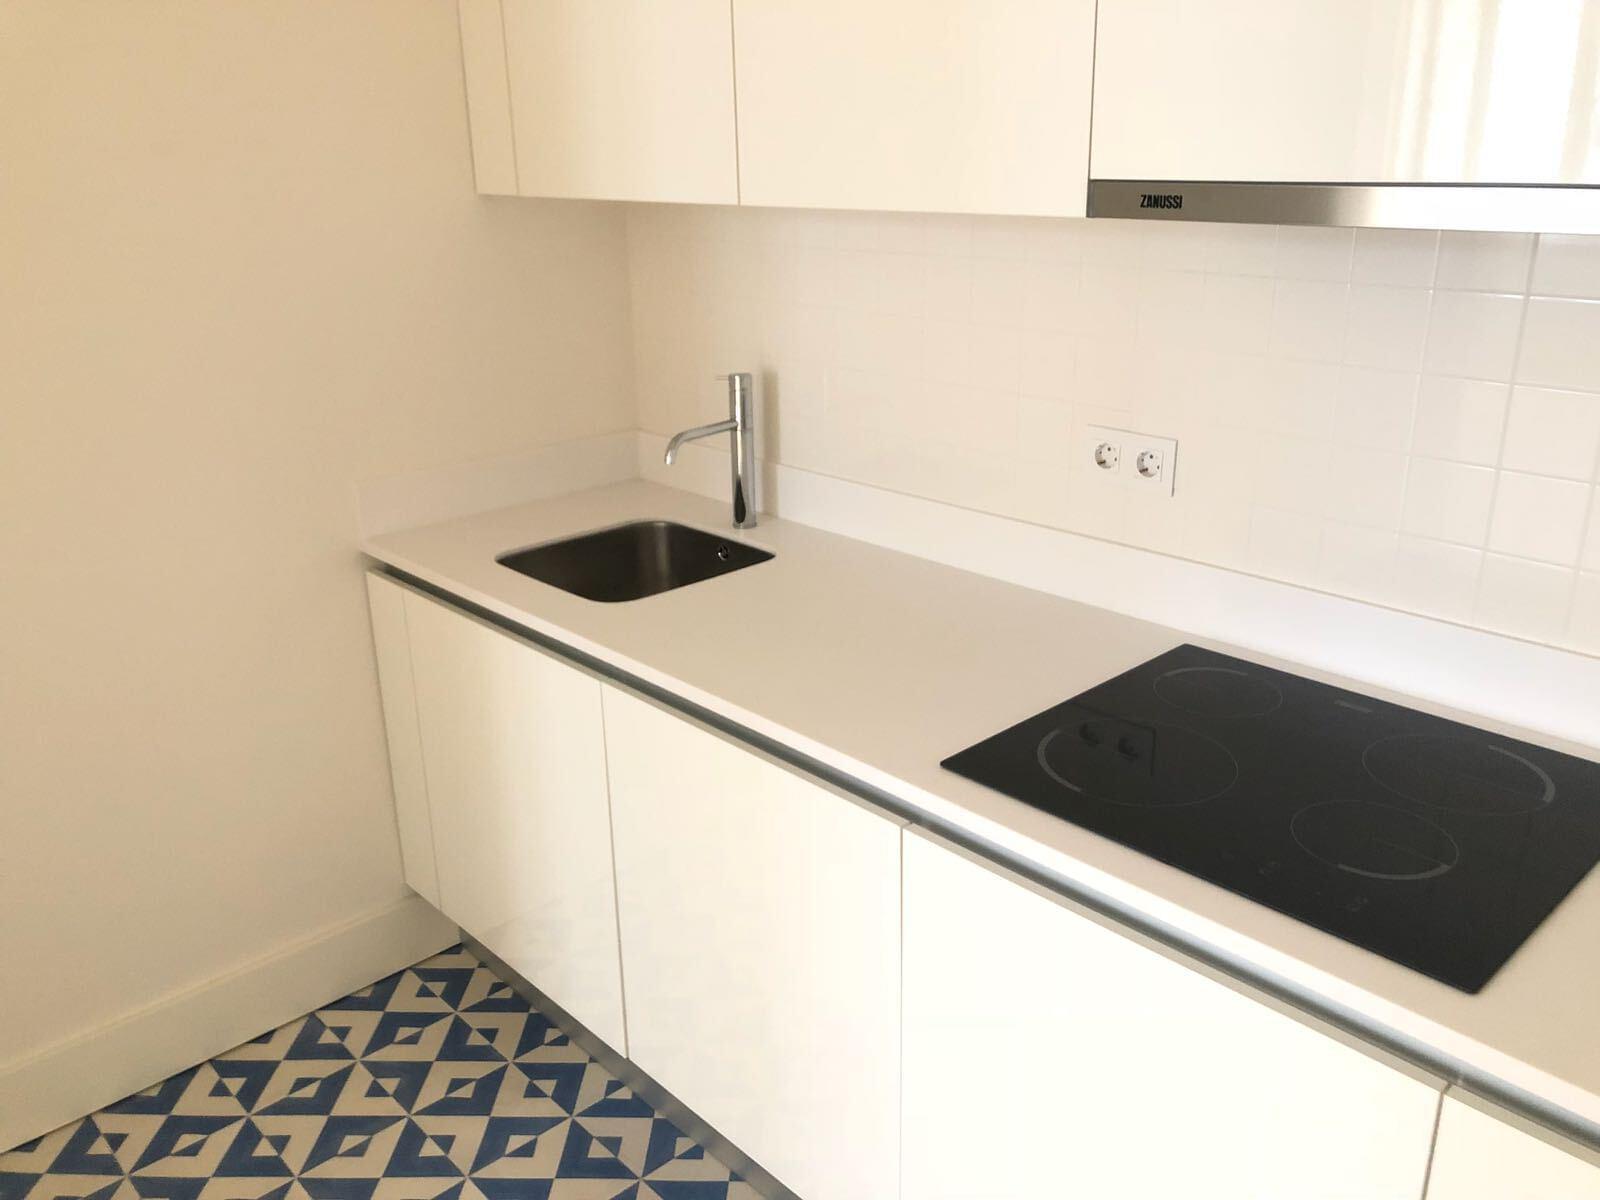 pf17142-apartamento-t2-lisboa-5f53a5b7-b87d-485f-b0e5-73b1fc3425da